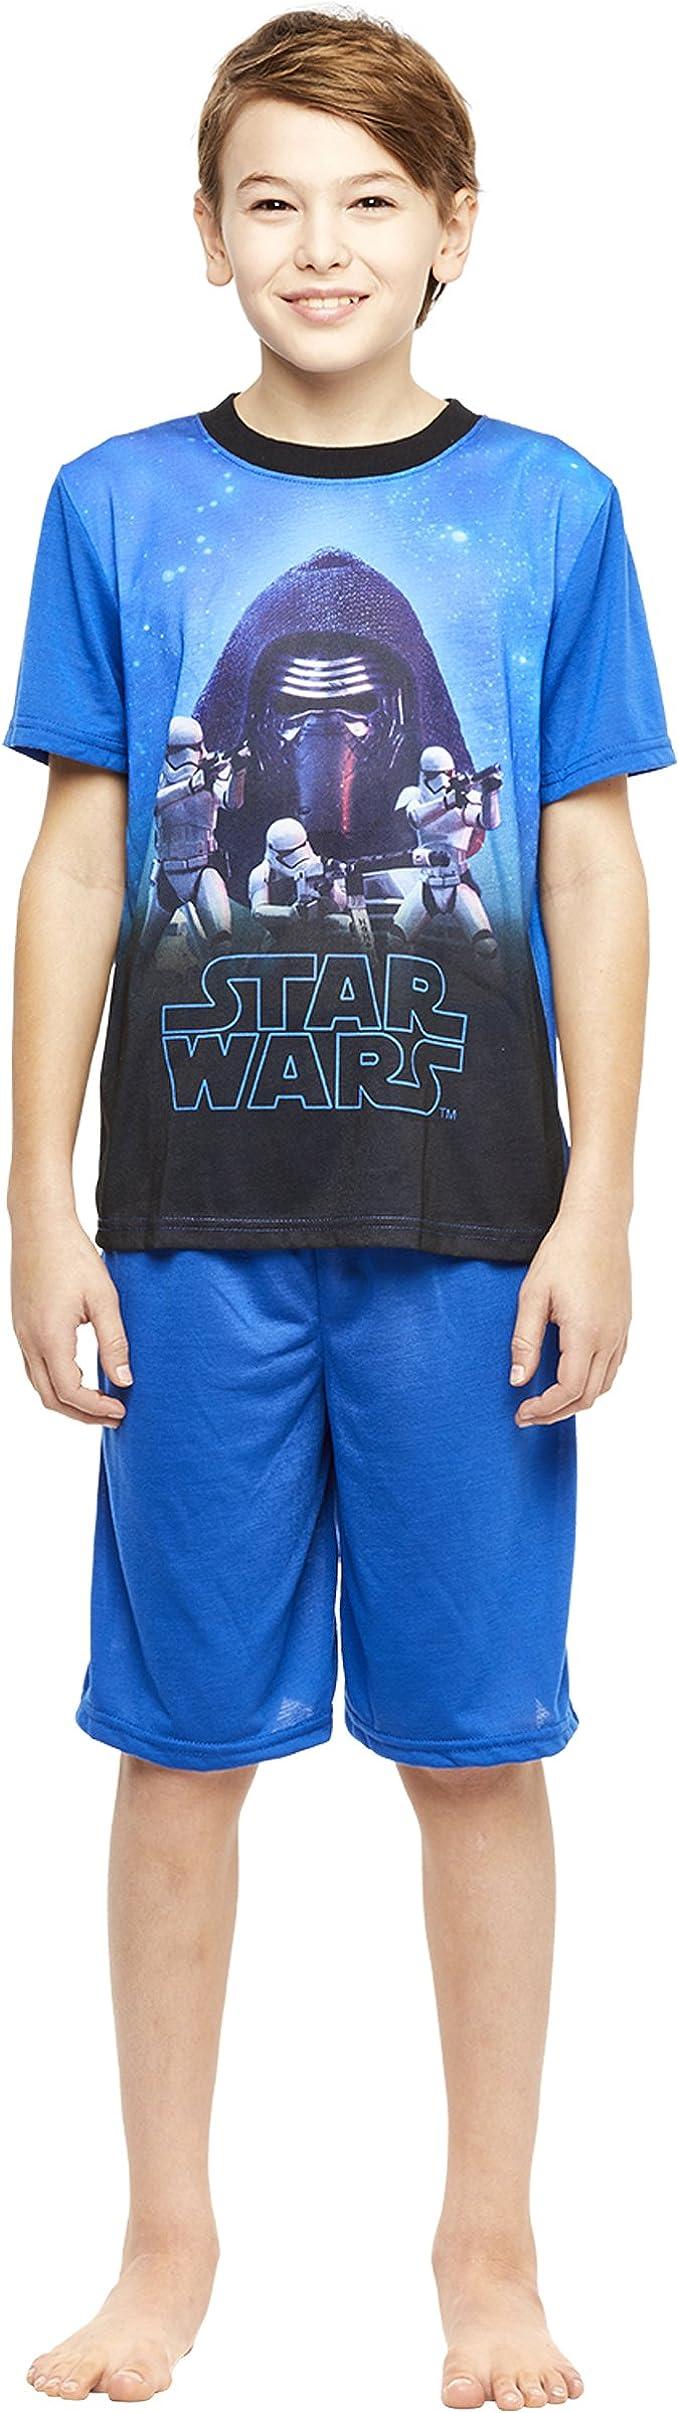 Jellifish Kids Boys 2-Piece Pajamas Set Short-Sleeve Top and Shorts